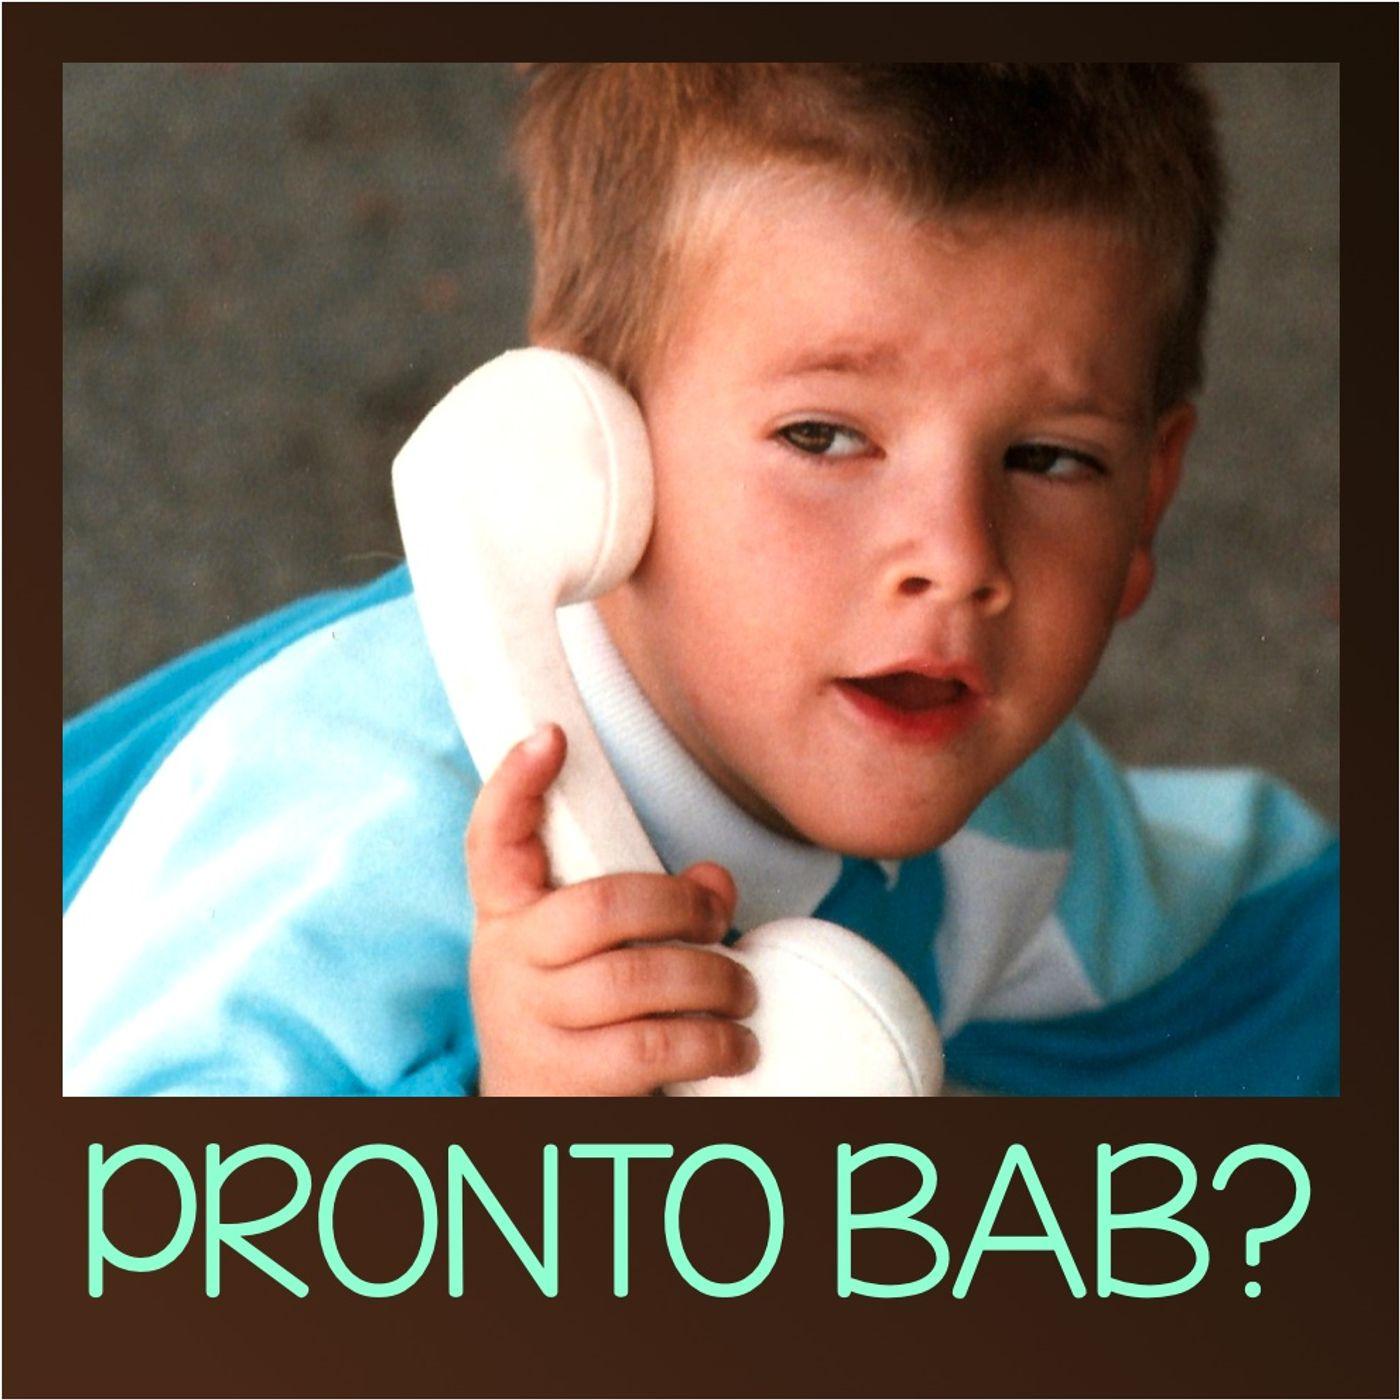 - PRONTO BAB? - Stefania Belmondo